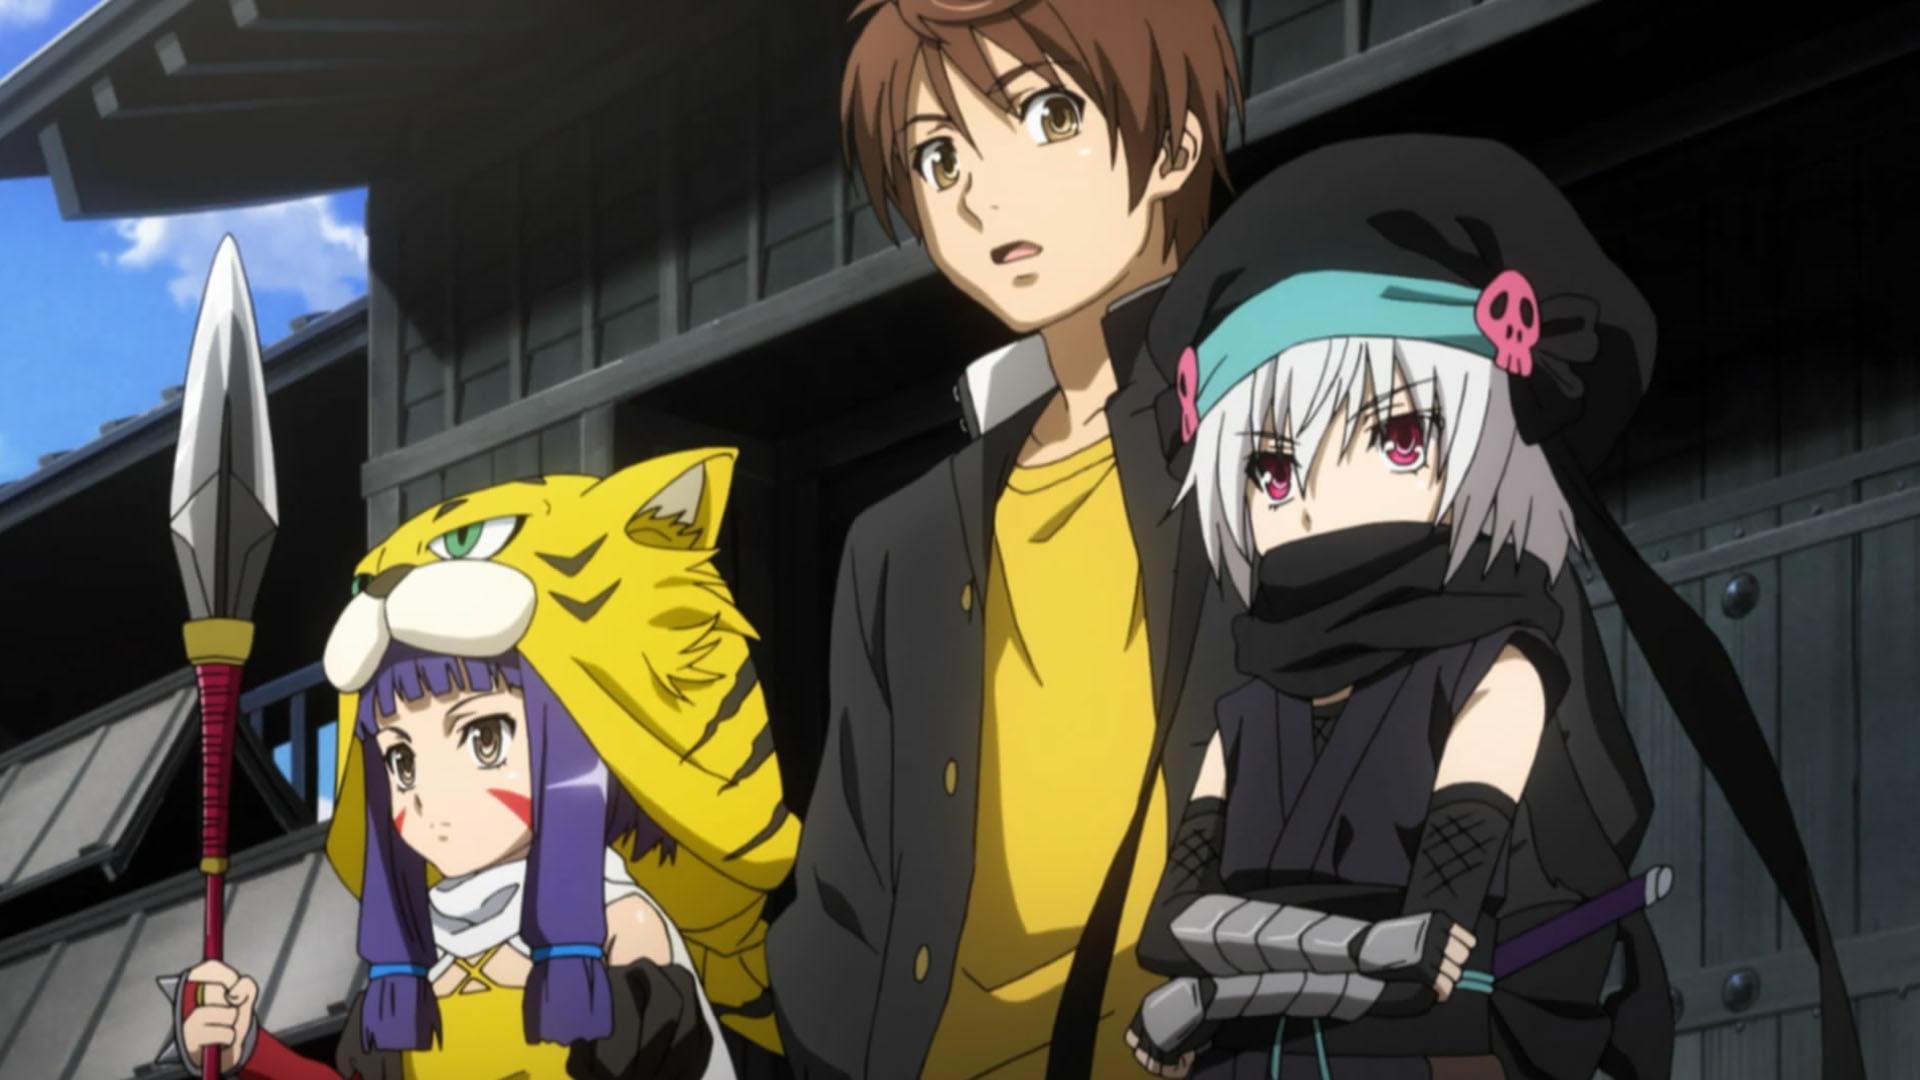 Recomendaciones Frutales 8 - Oda Nobuna No Yabou(Anime) Oda%20Nobuna%20no%20Yabou%20-%2004%20-%20Large%2003